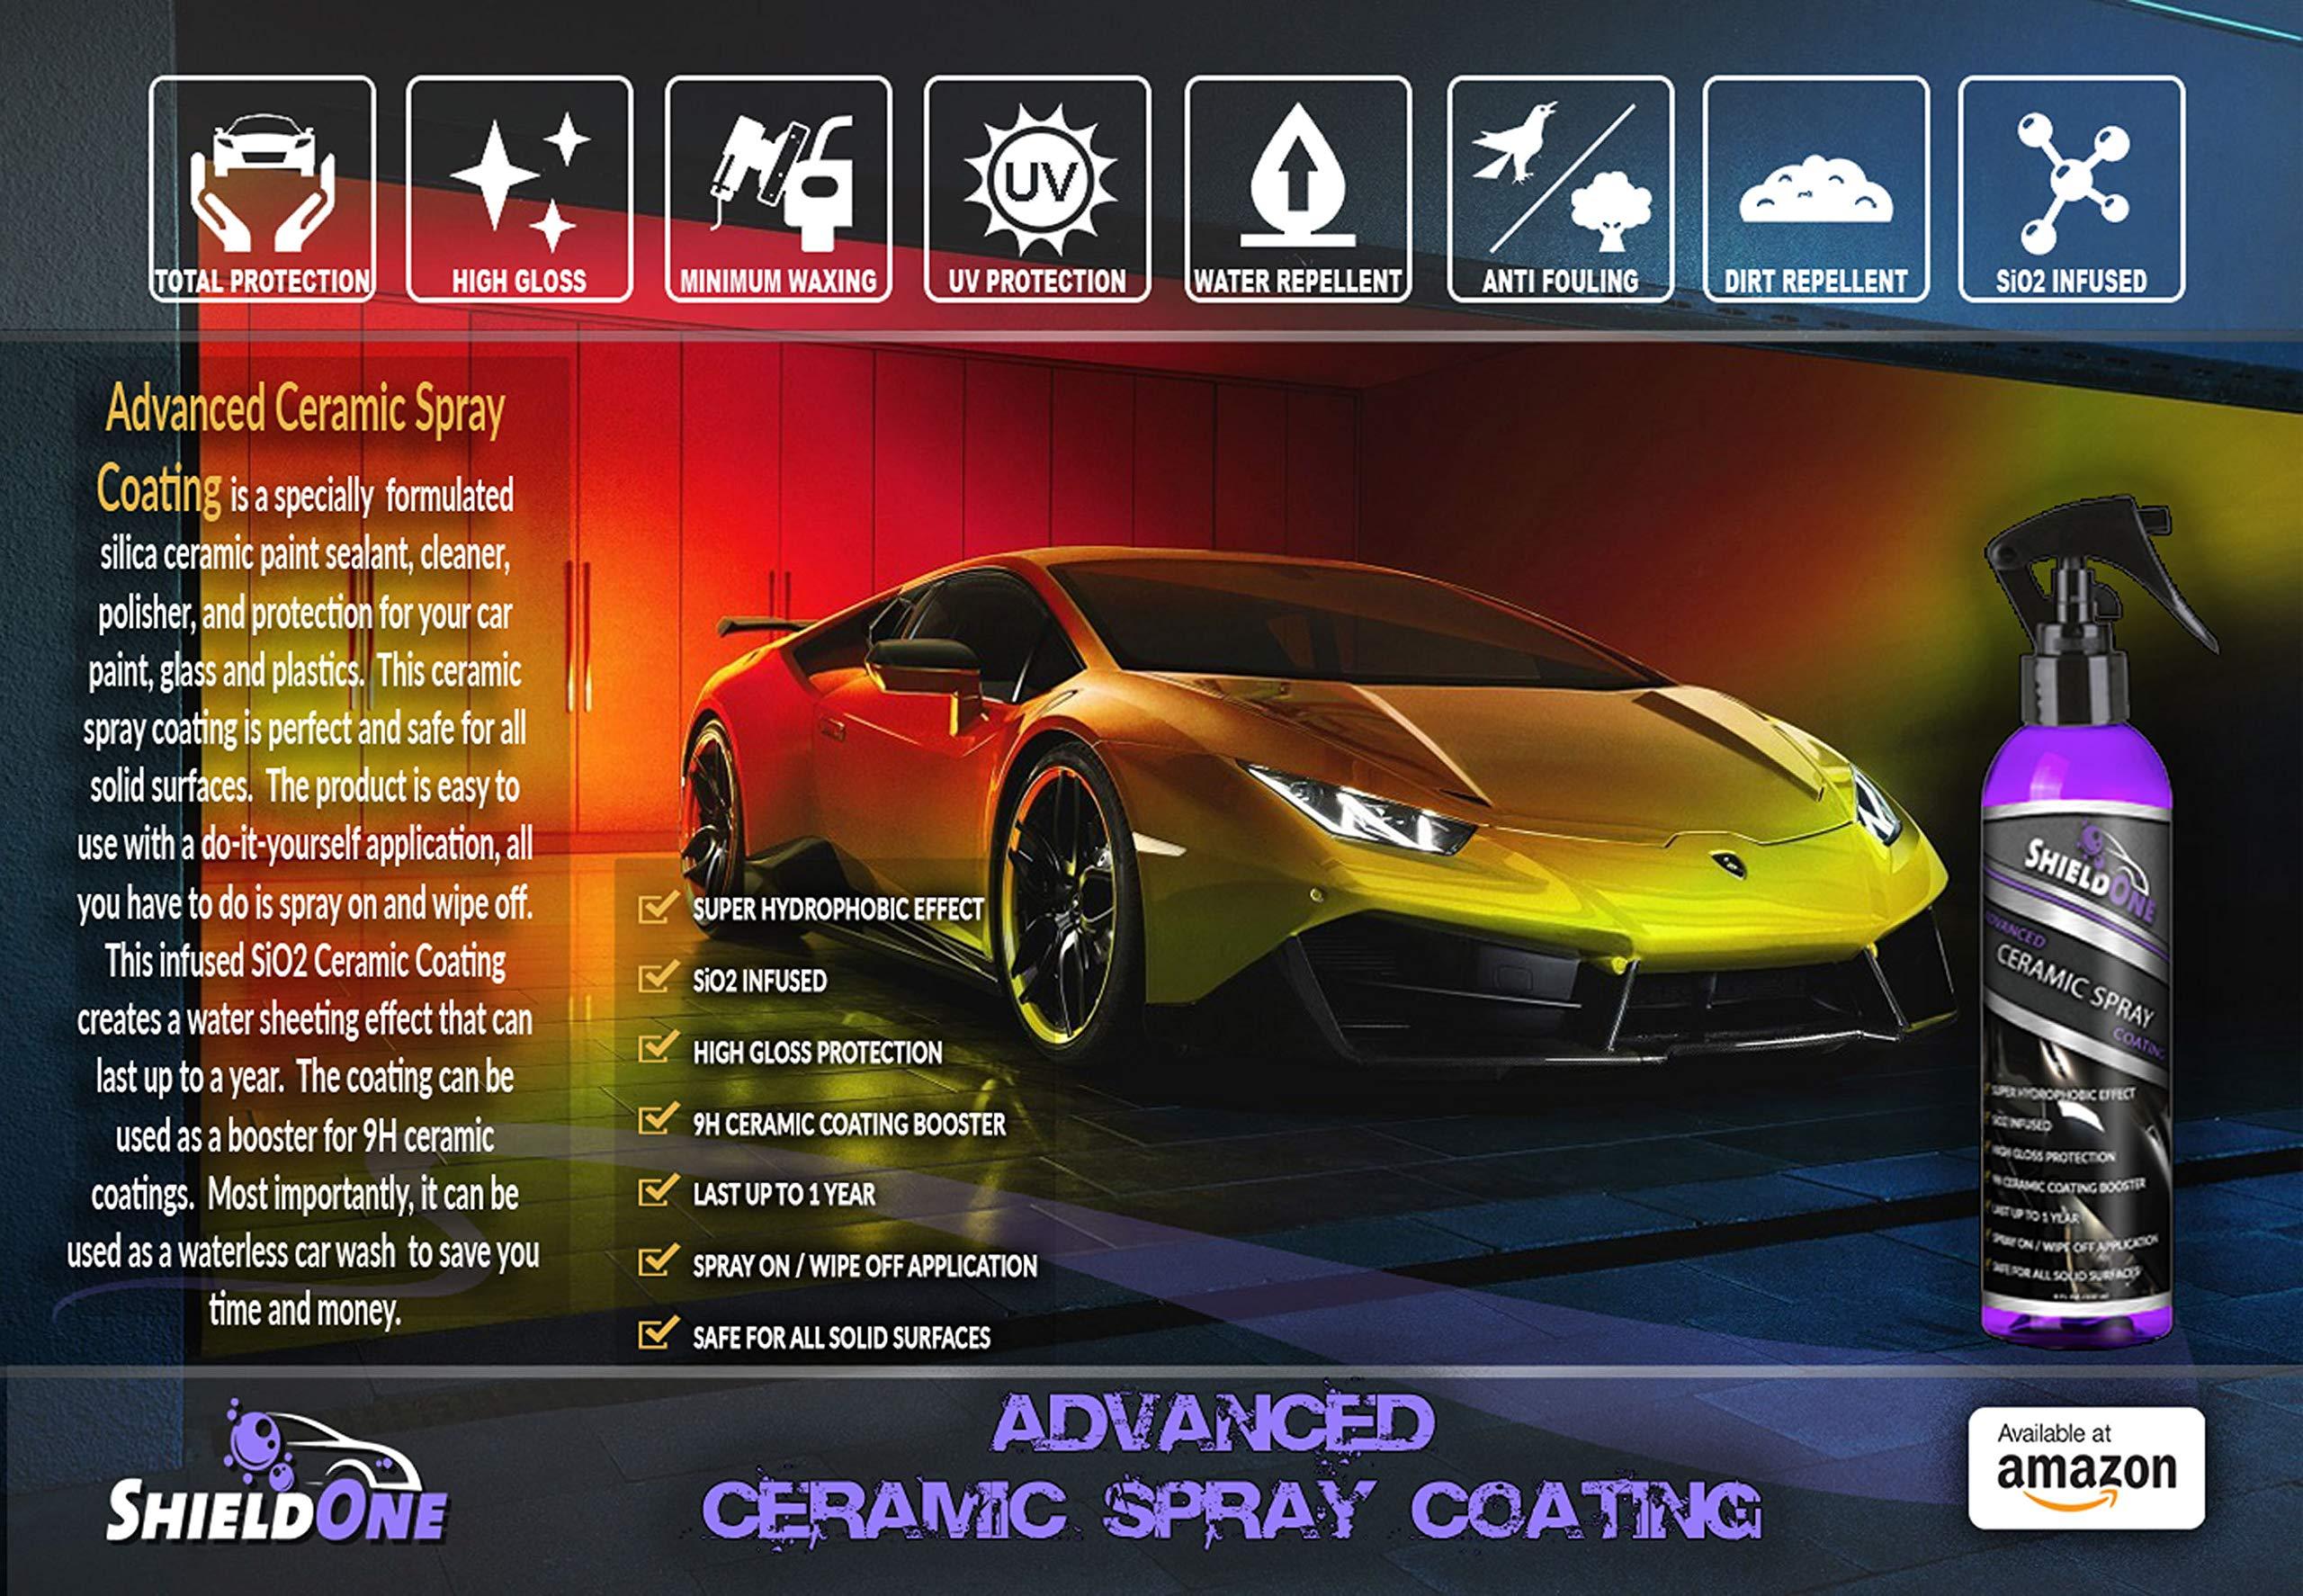 Shield One Advanced Ceramic Spray Coating - Car Topcoat - Premium Car Polish - Automotive Ceramic Shine - Multiple Surface Use - Professional Car Protection - Top Coat Polish - Waterless Car Wash by Shield One (Image #2)